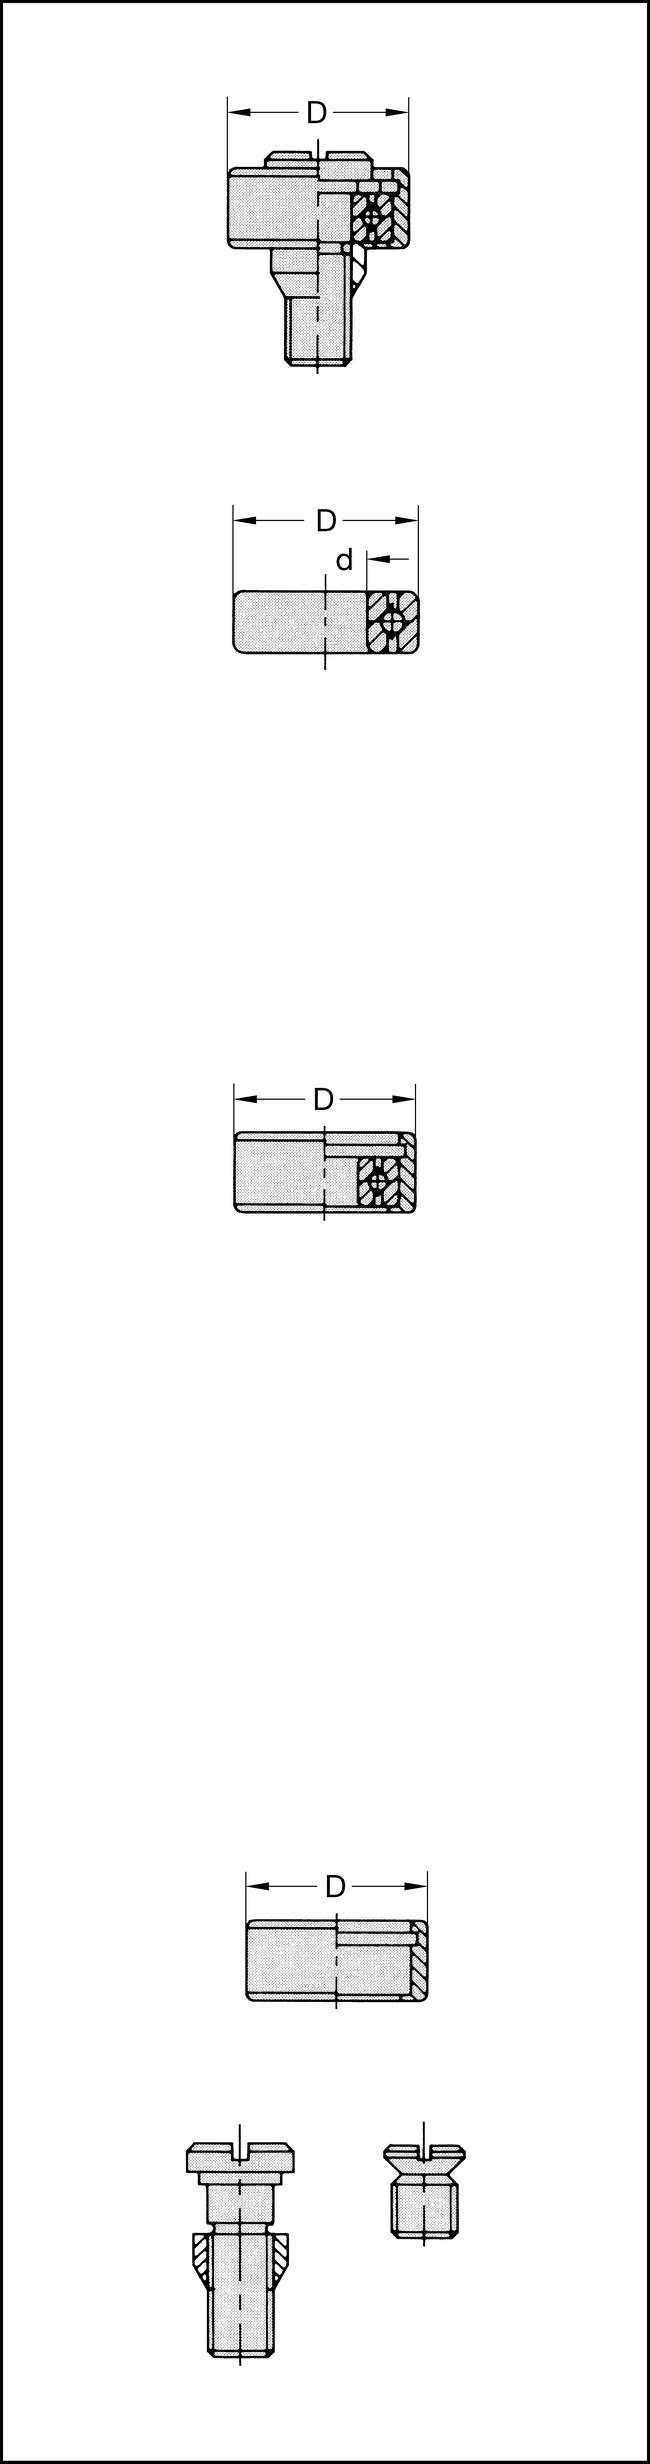 Kugellager 19x6mm d=8mm